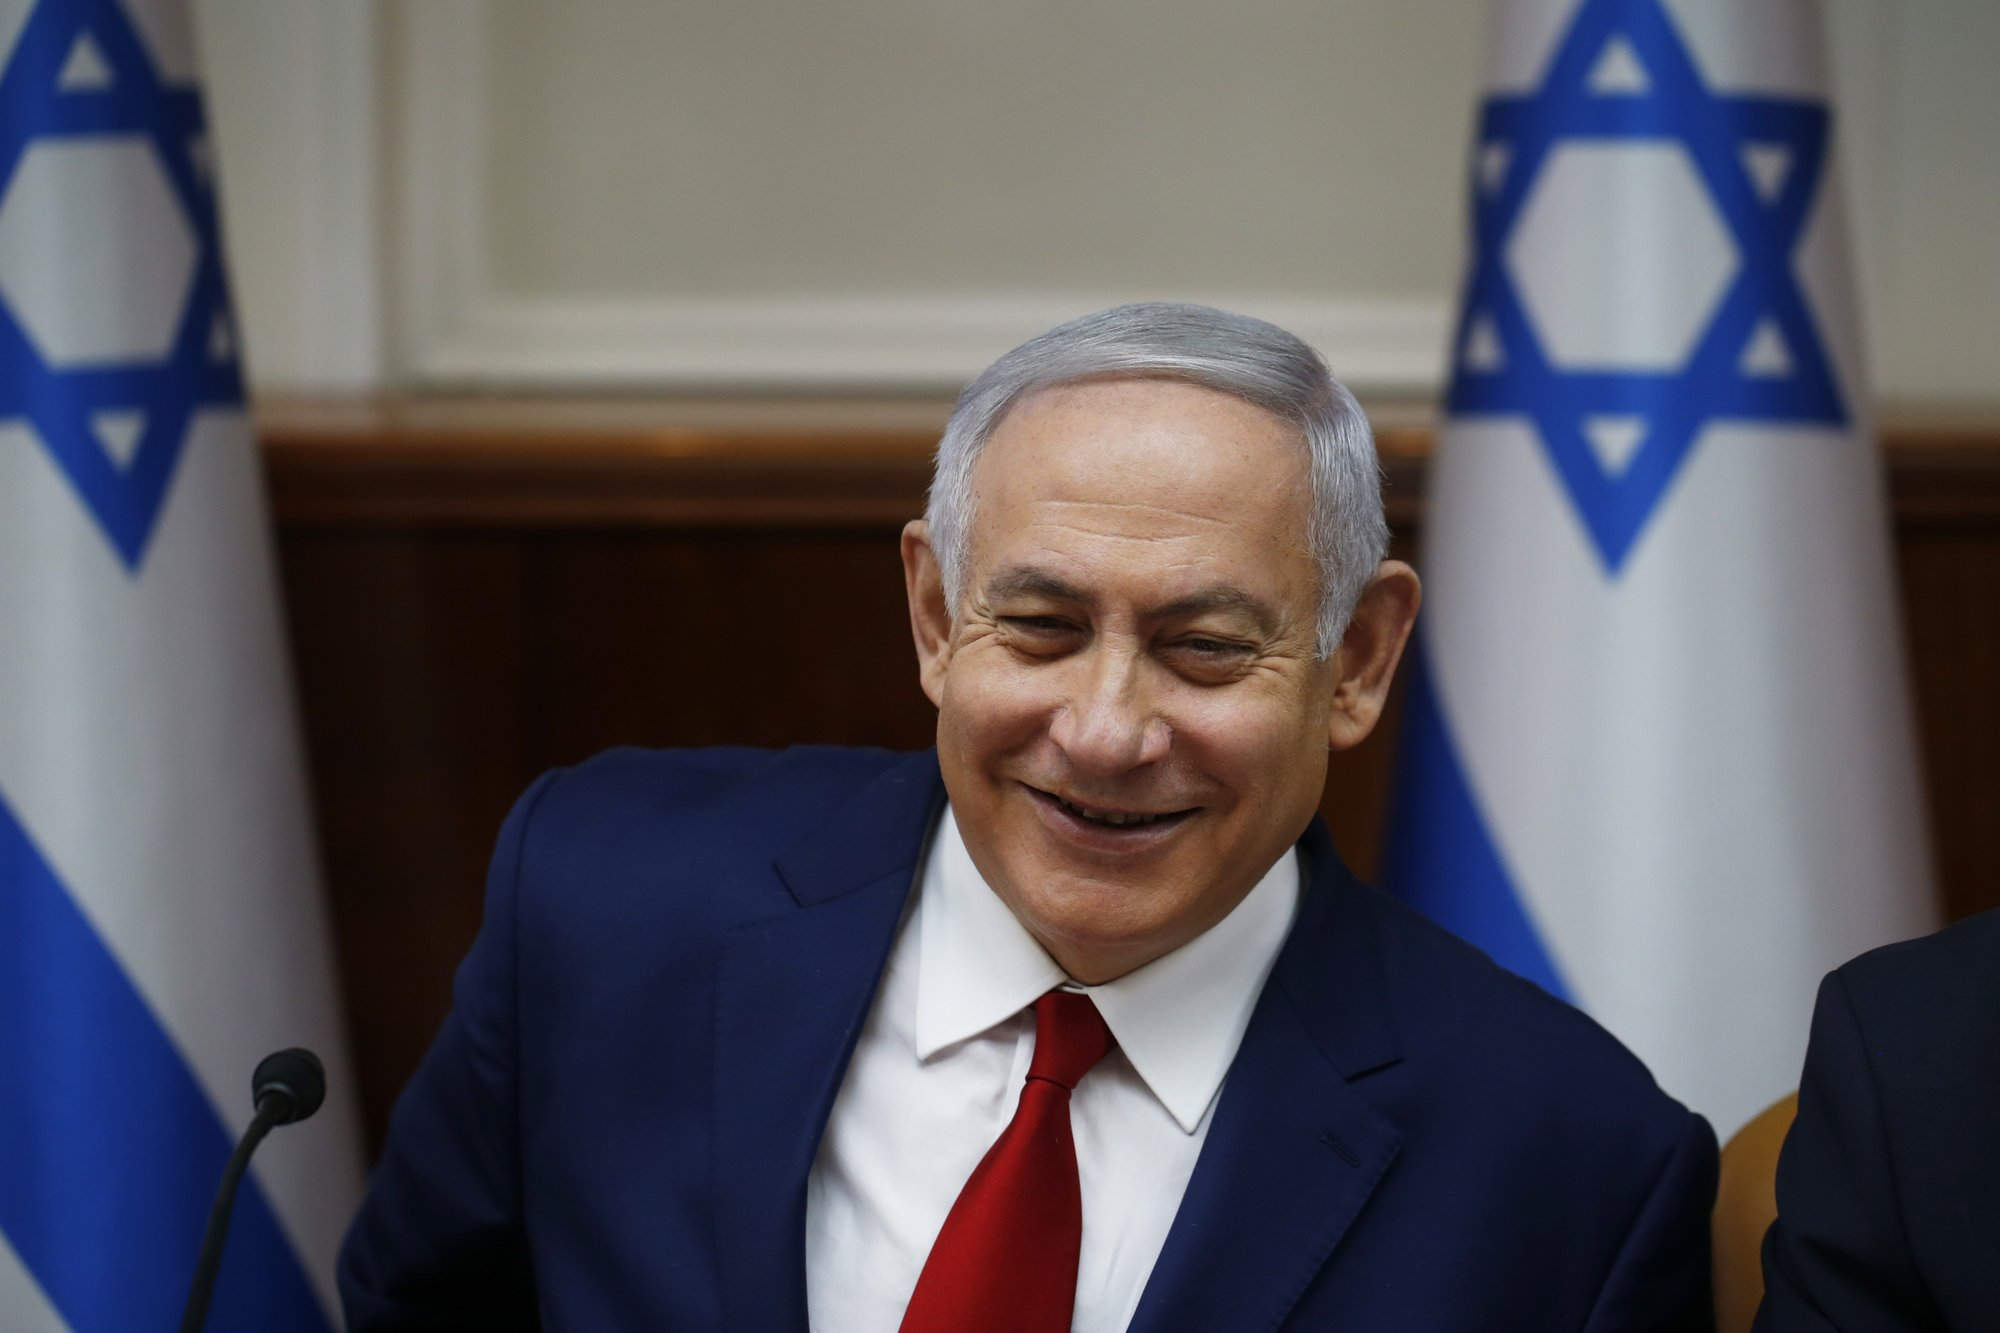 Fragmentation Helps Netanyahu Re Election Hopes